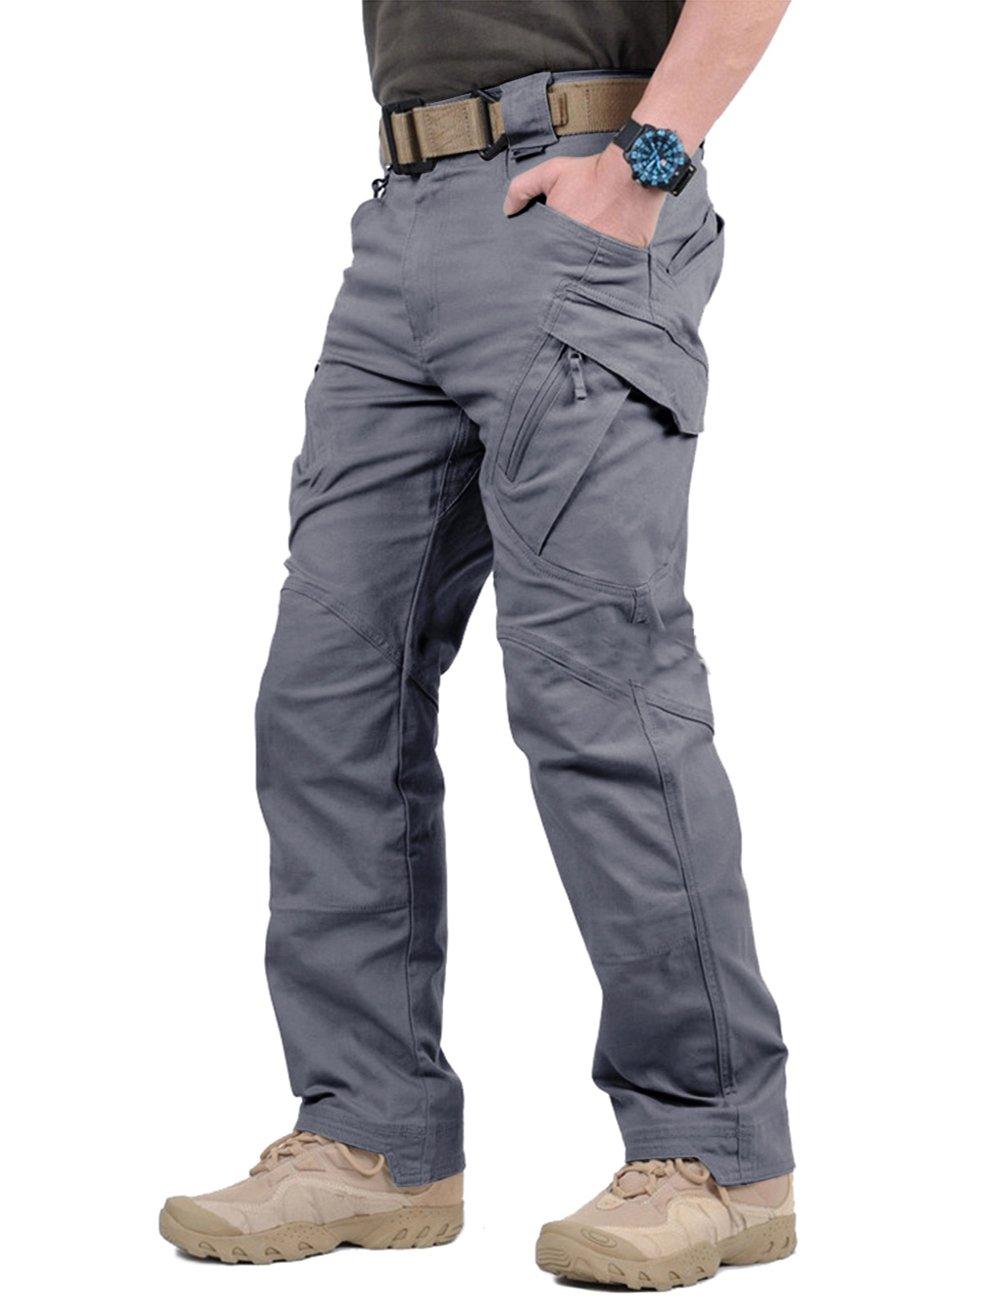 TACVASEN Men's Tactical Urban Ops Tactical Pants Climbing Hiking Hunting Cargo Pants Trousers Gray